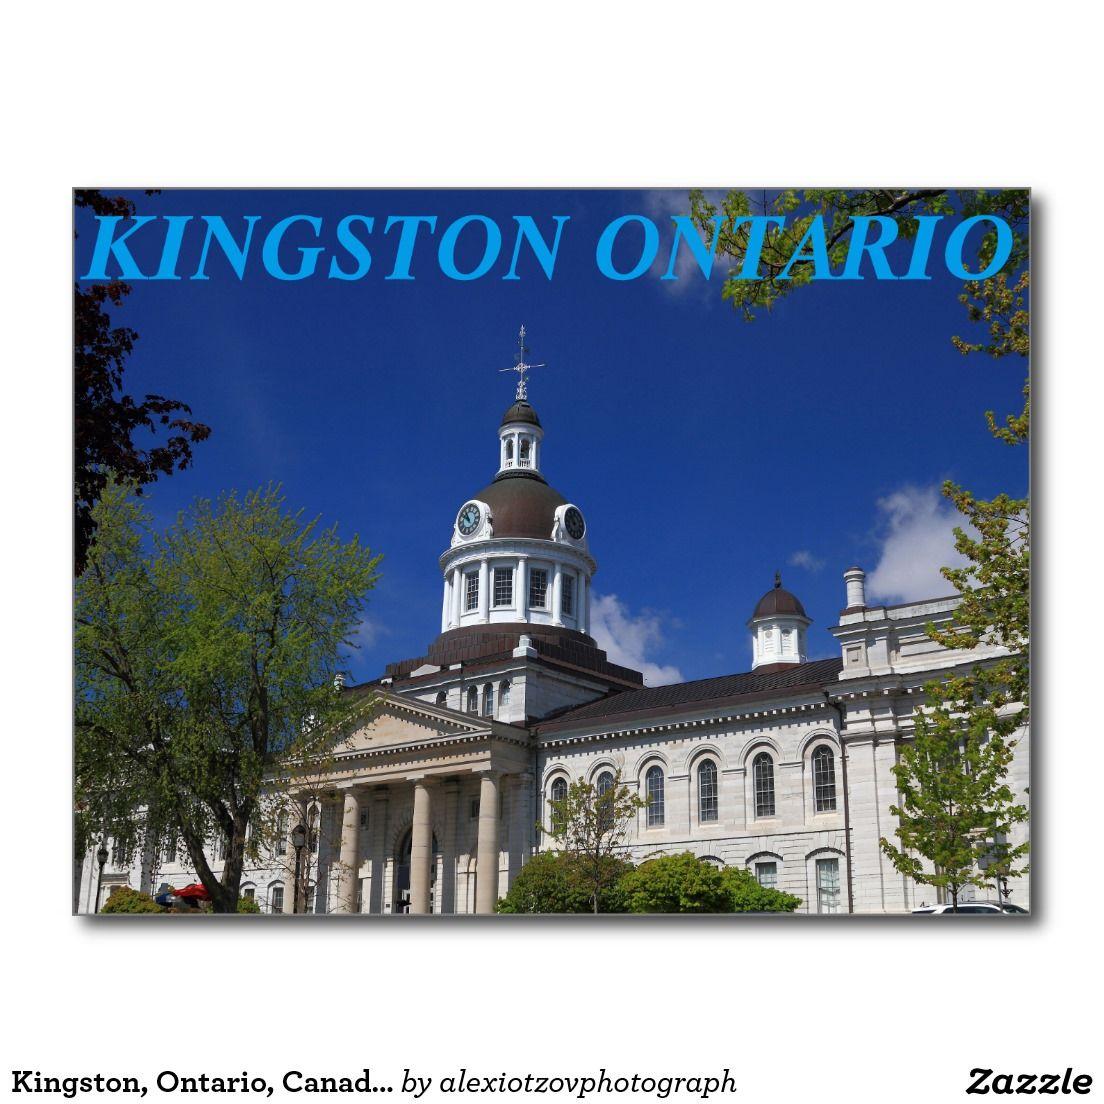 Kingston, Ontario, Canada City Hall Post Card City Hall